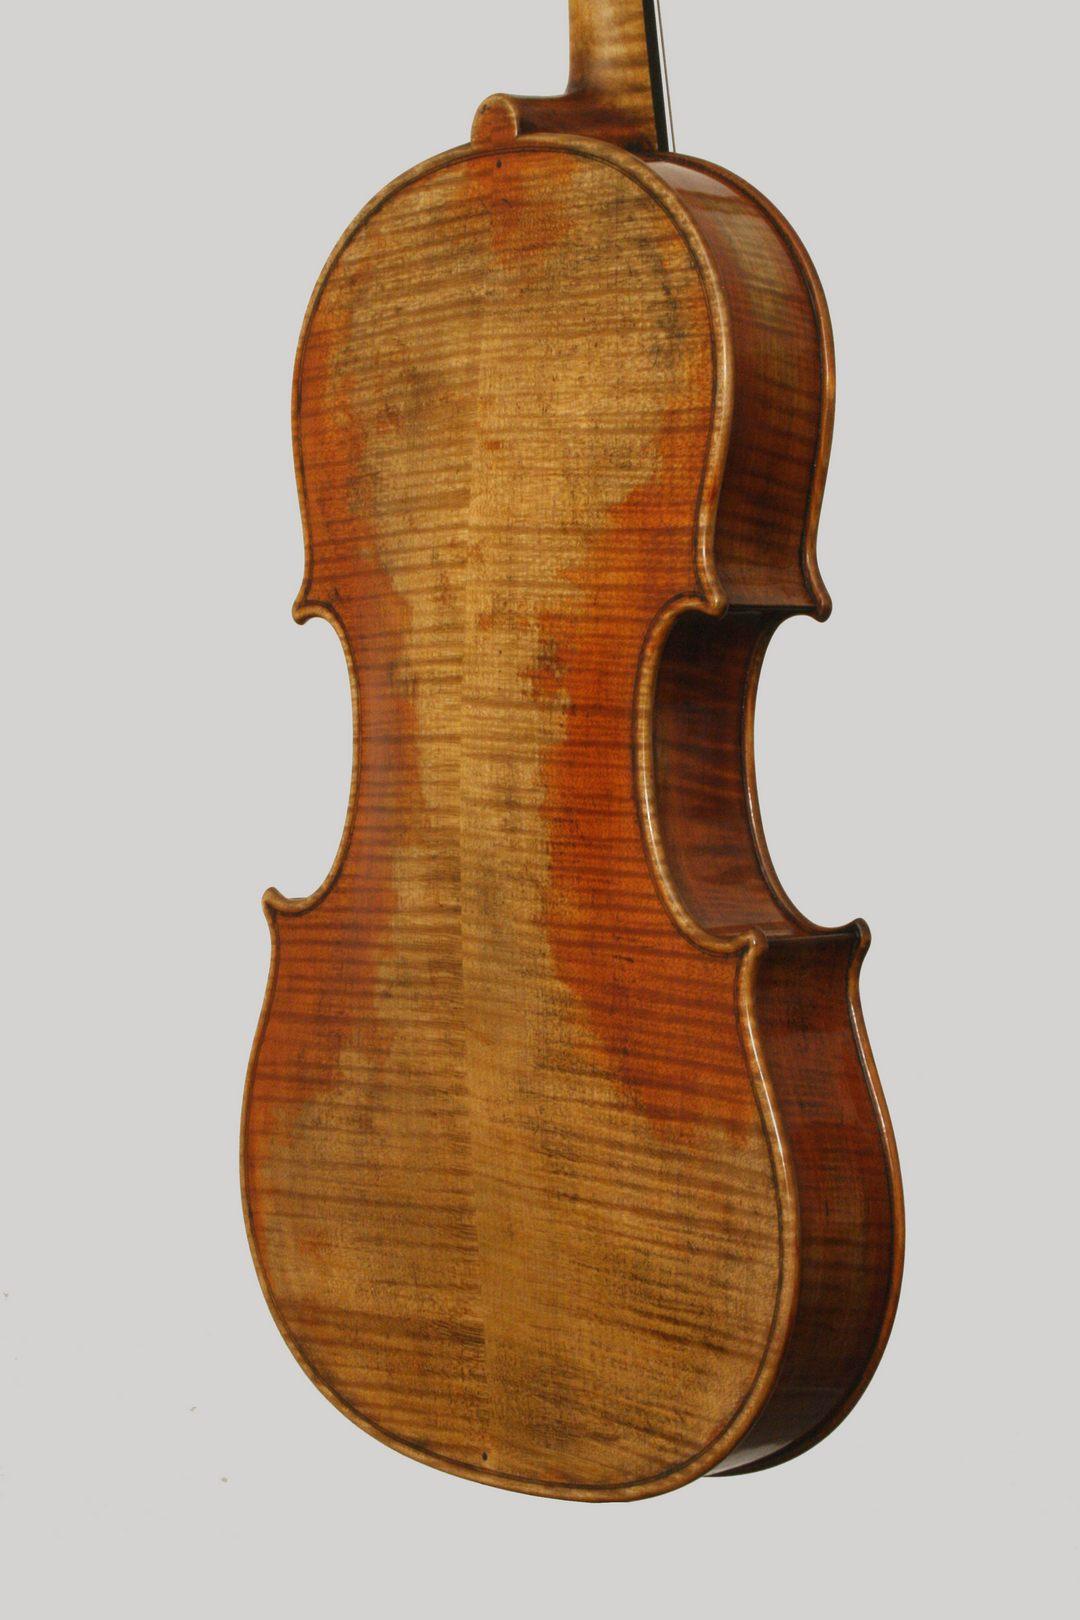 Viola LASSAN 2013 A.Stradivari model (Mahler 1672)